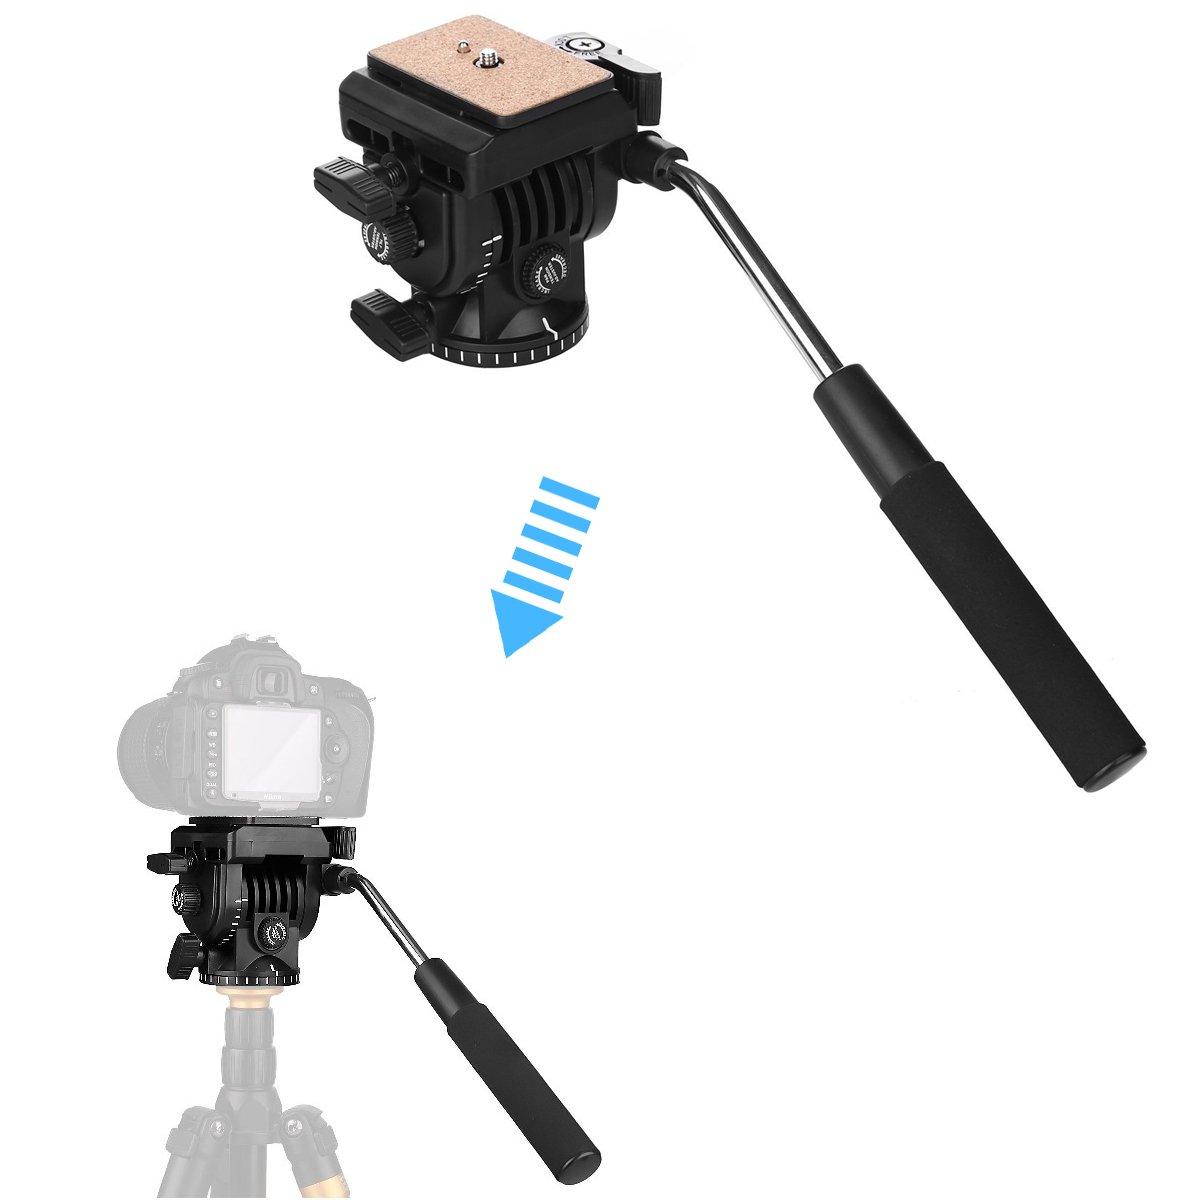 Video Camera Tripod Fluid Head, Papaler Action Fluid Drag Pan Head For Canon Nikon Sony DSLR Camera Camcorder Shooting Filming